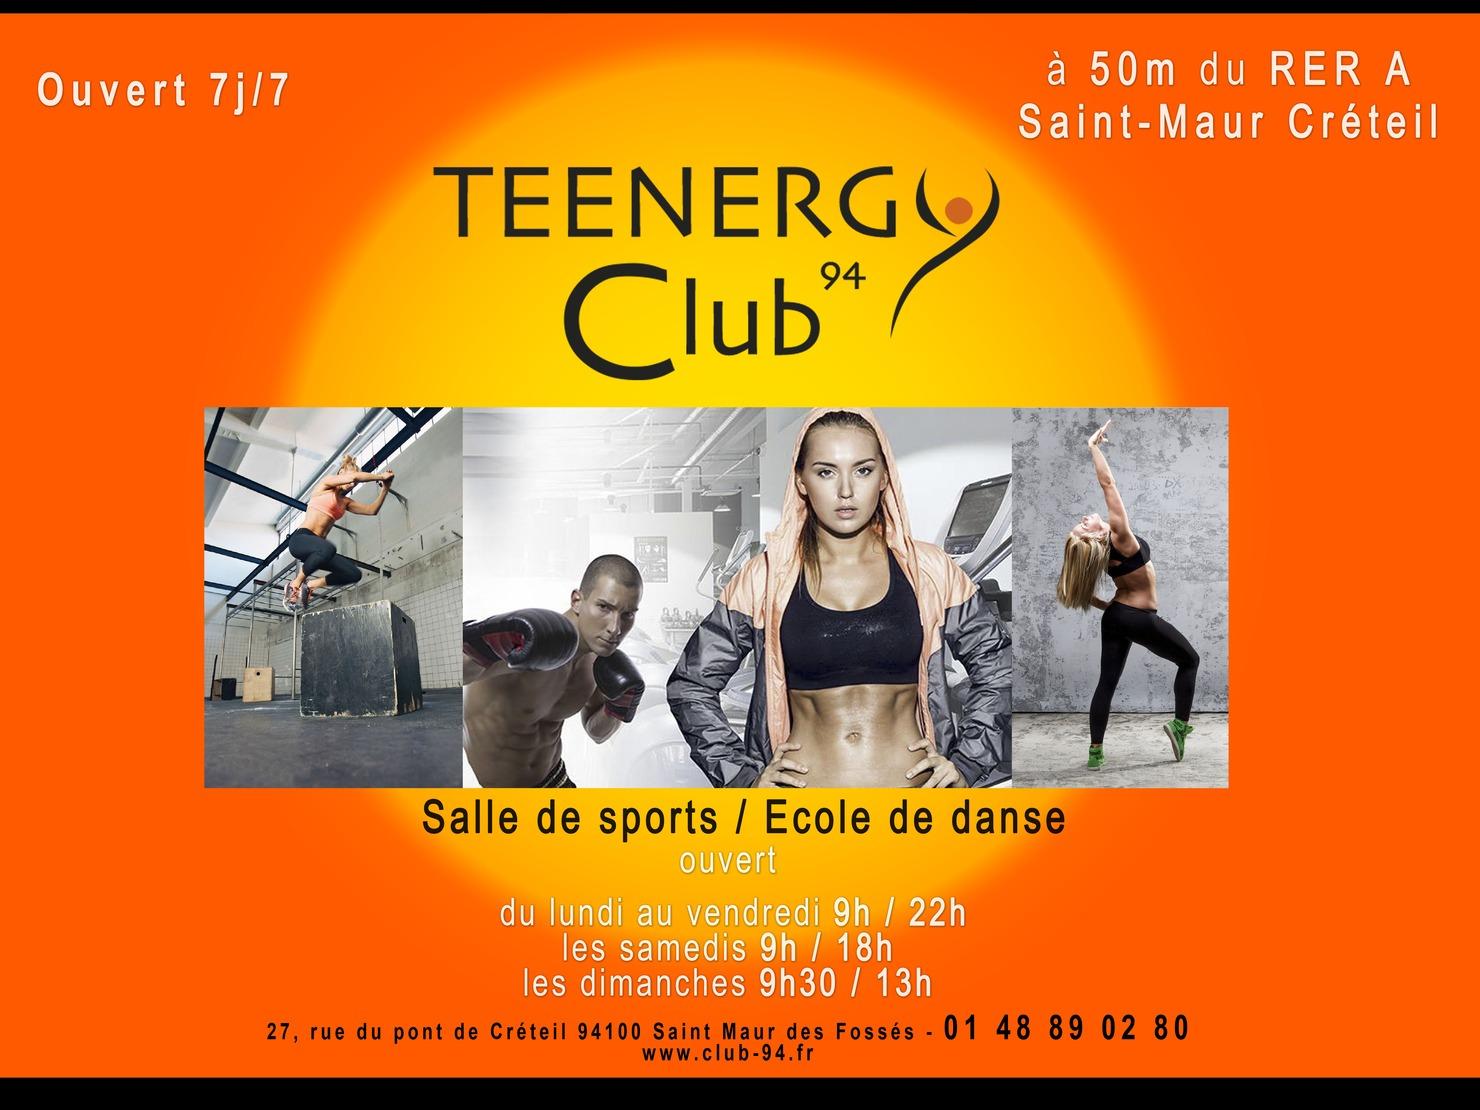 Teenergy Club 94